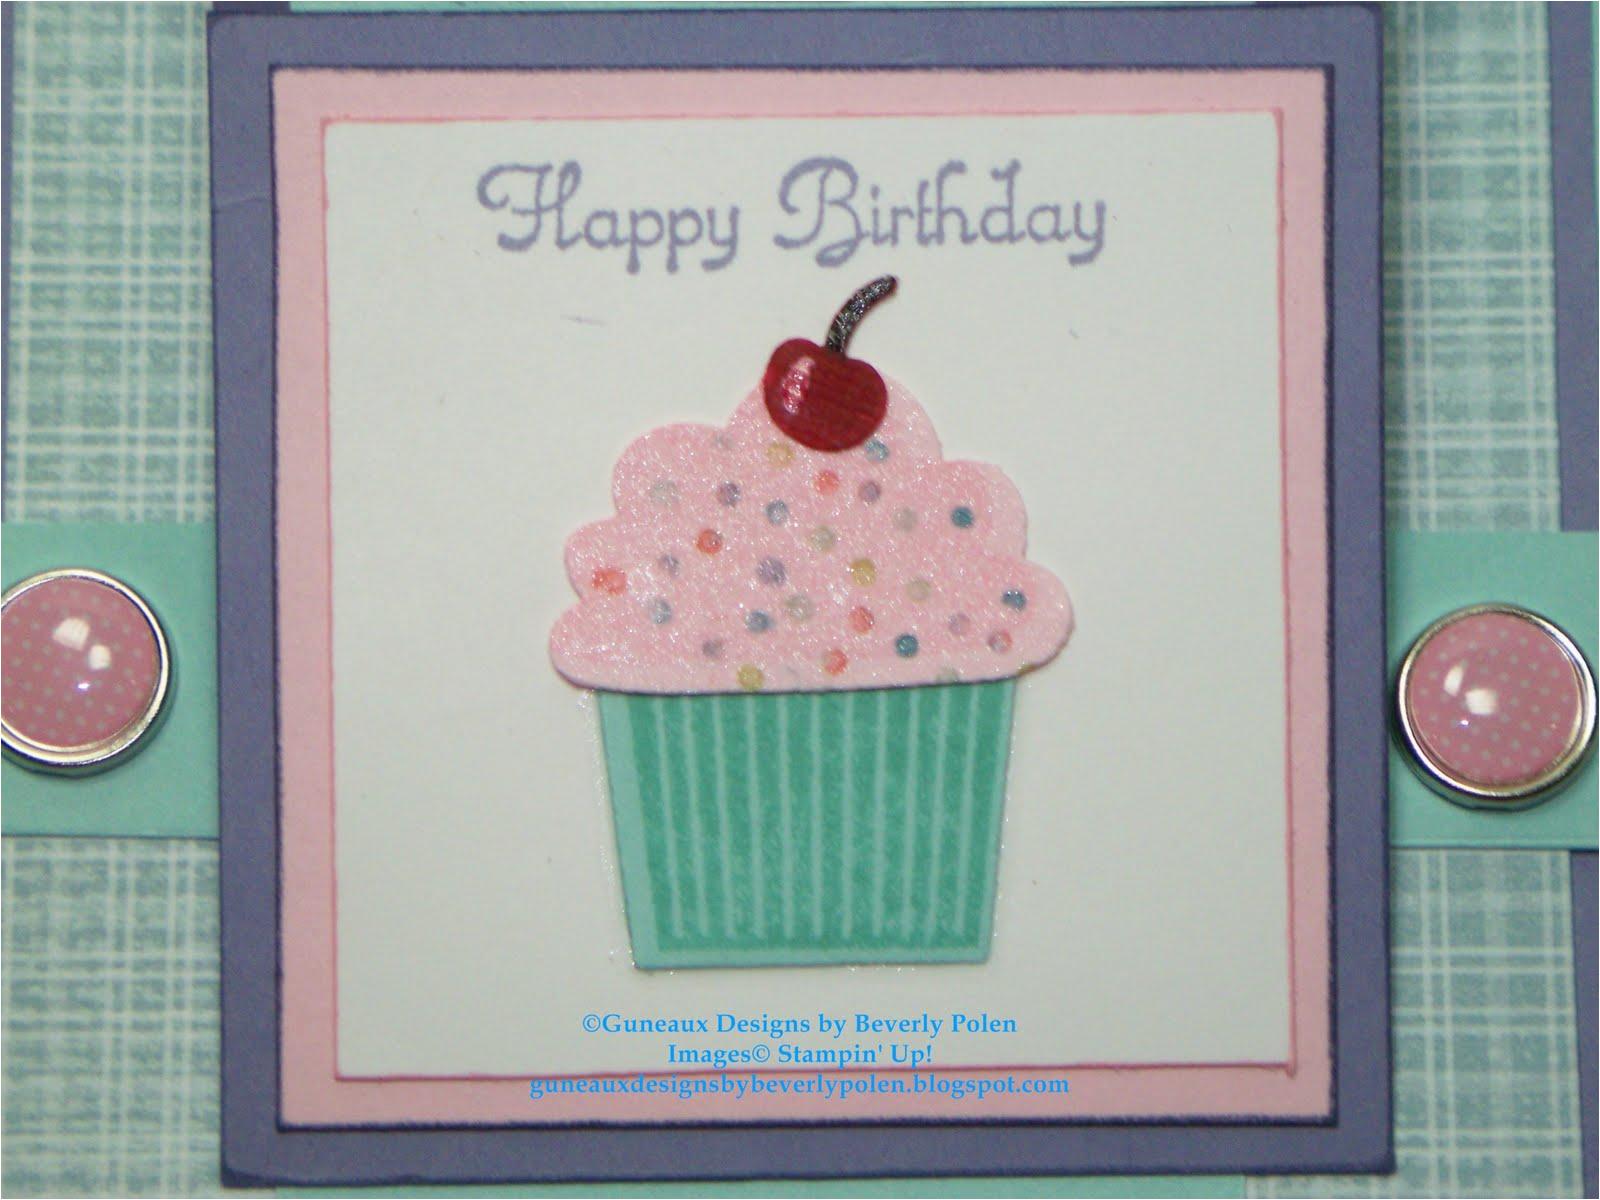 Free Birthday Cards Online No Membership Create Birthday Card Online with Photo Xcombear